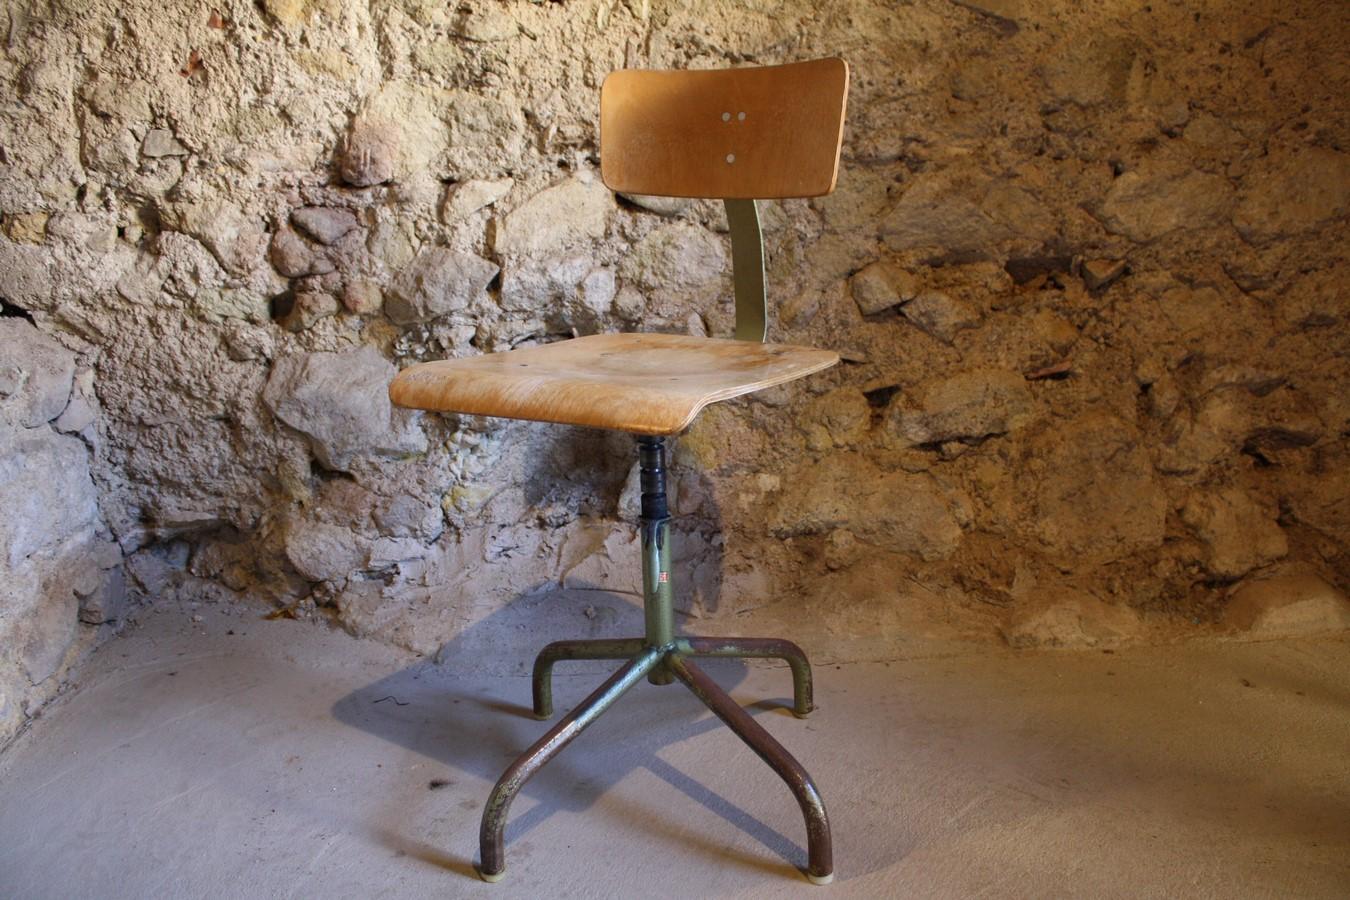 werkstattstuhle-industriestuhle-industrie-design-stuhle-gebraucht-alt-vintage-loft-8